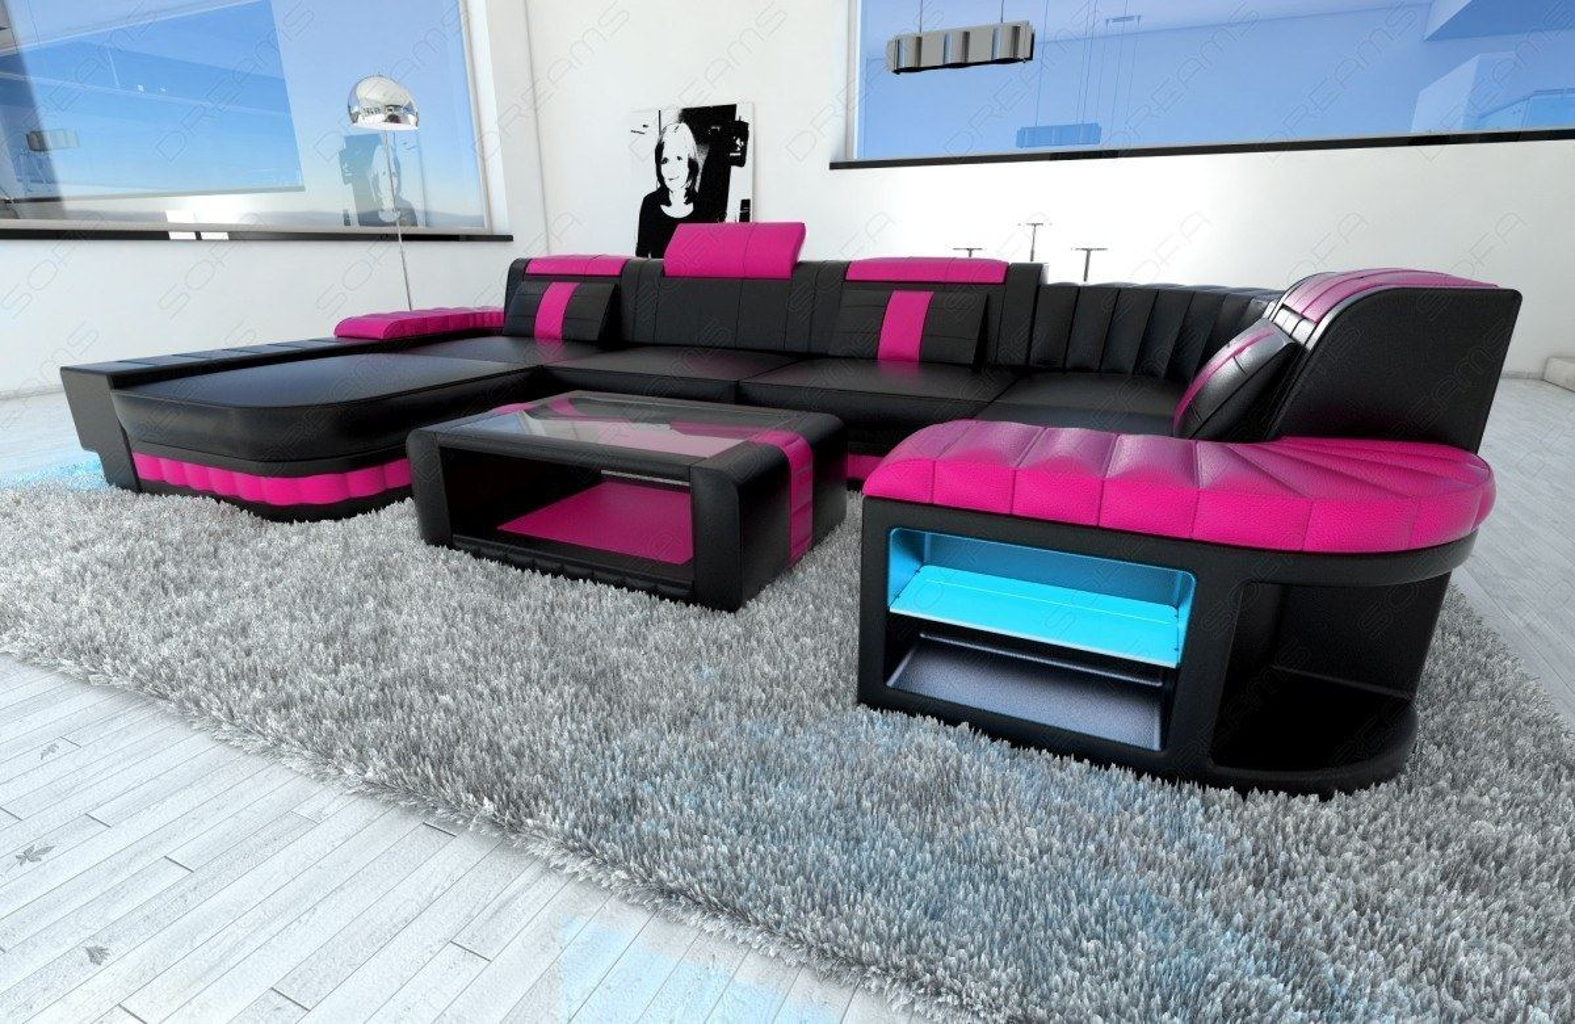 eckcouch designer wohnlandschaft bellagio u form schwarz pink led beleuchtung ebay. Black Bedroom Furniture Sets. Home Design Ideas